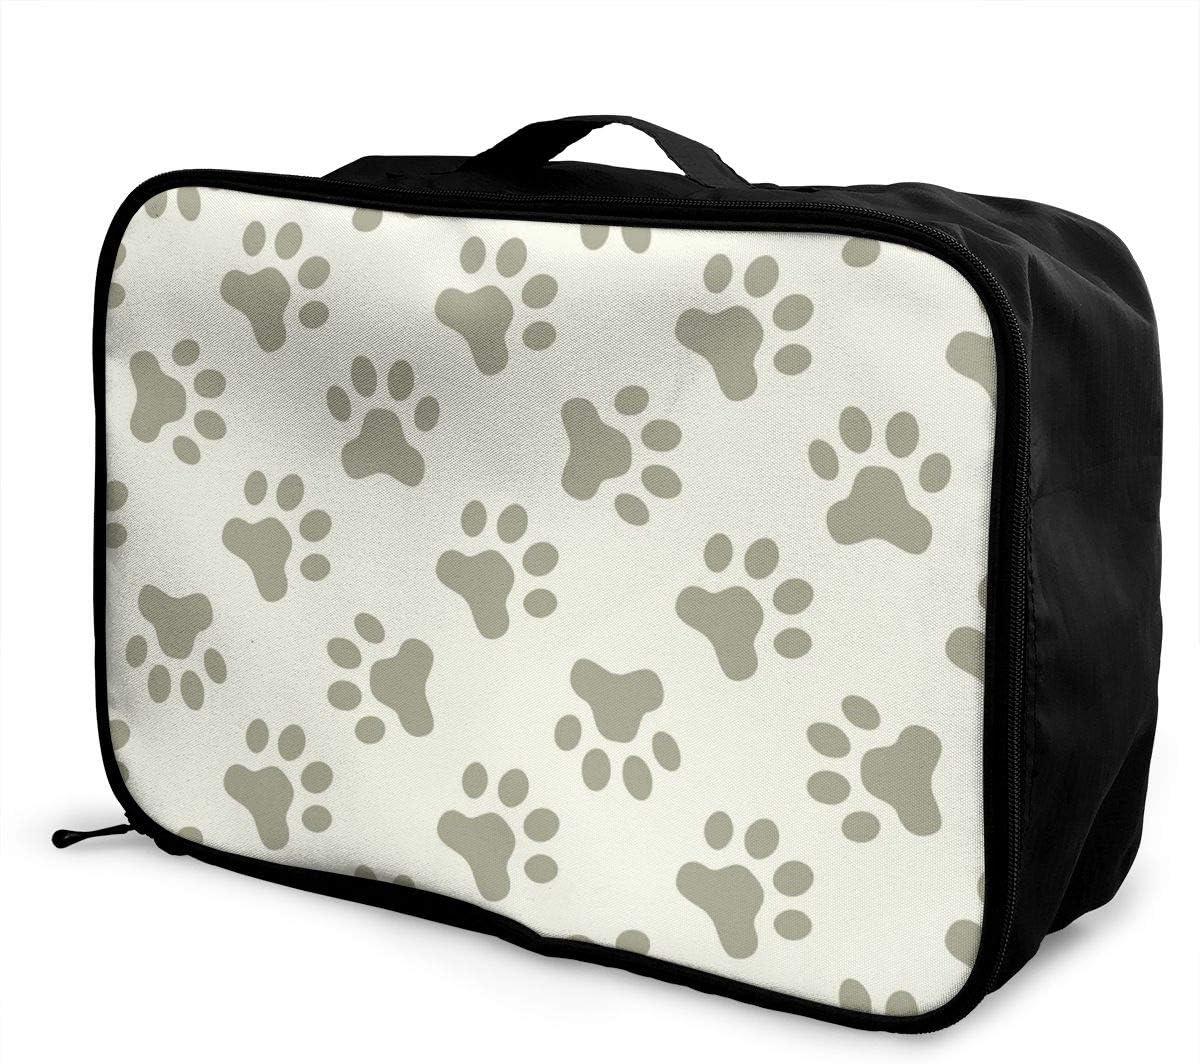 Yunshm Cat Or Dog Paw Seamless Pattern Vector Image Customized Trolley Handbag Waterproof Unisex Large Capacity For Business Travel Storage